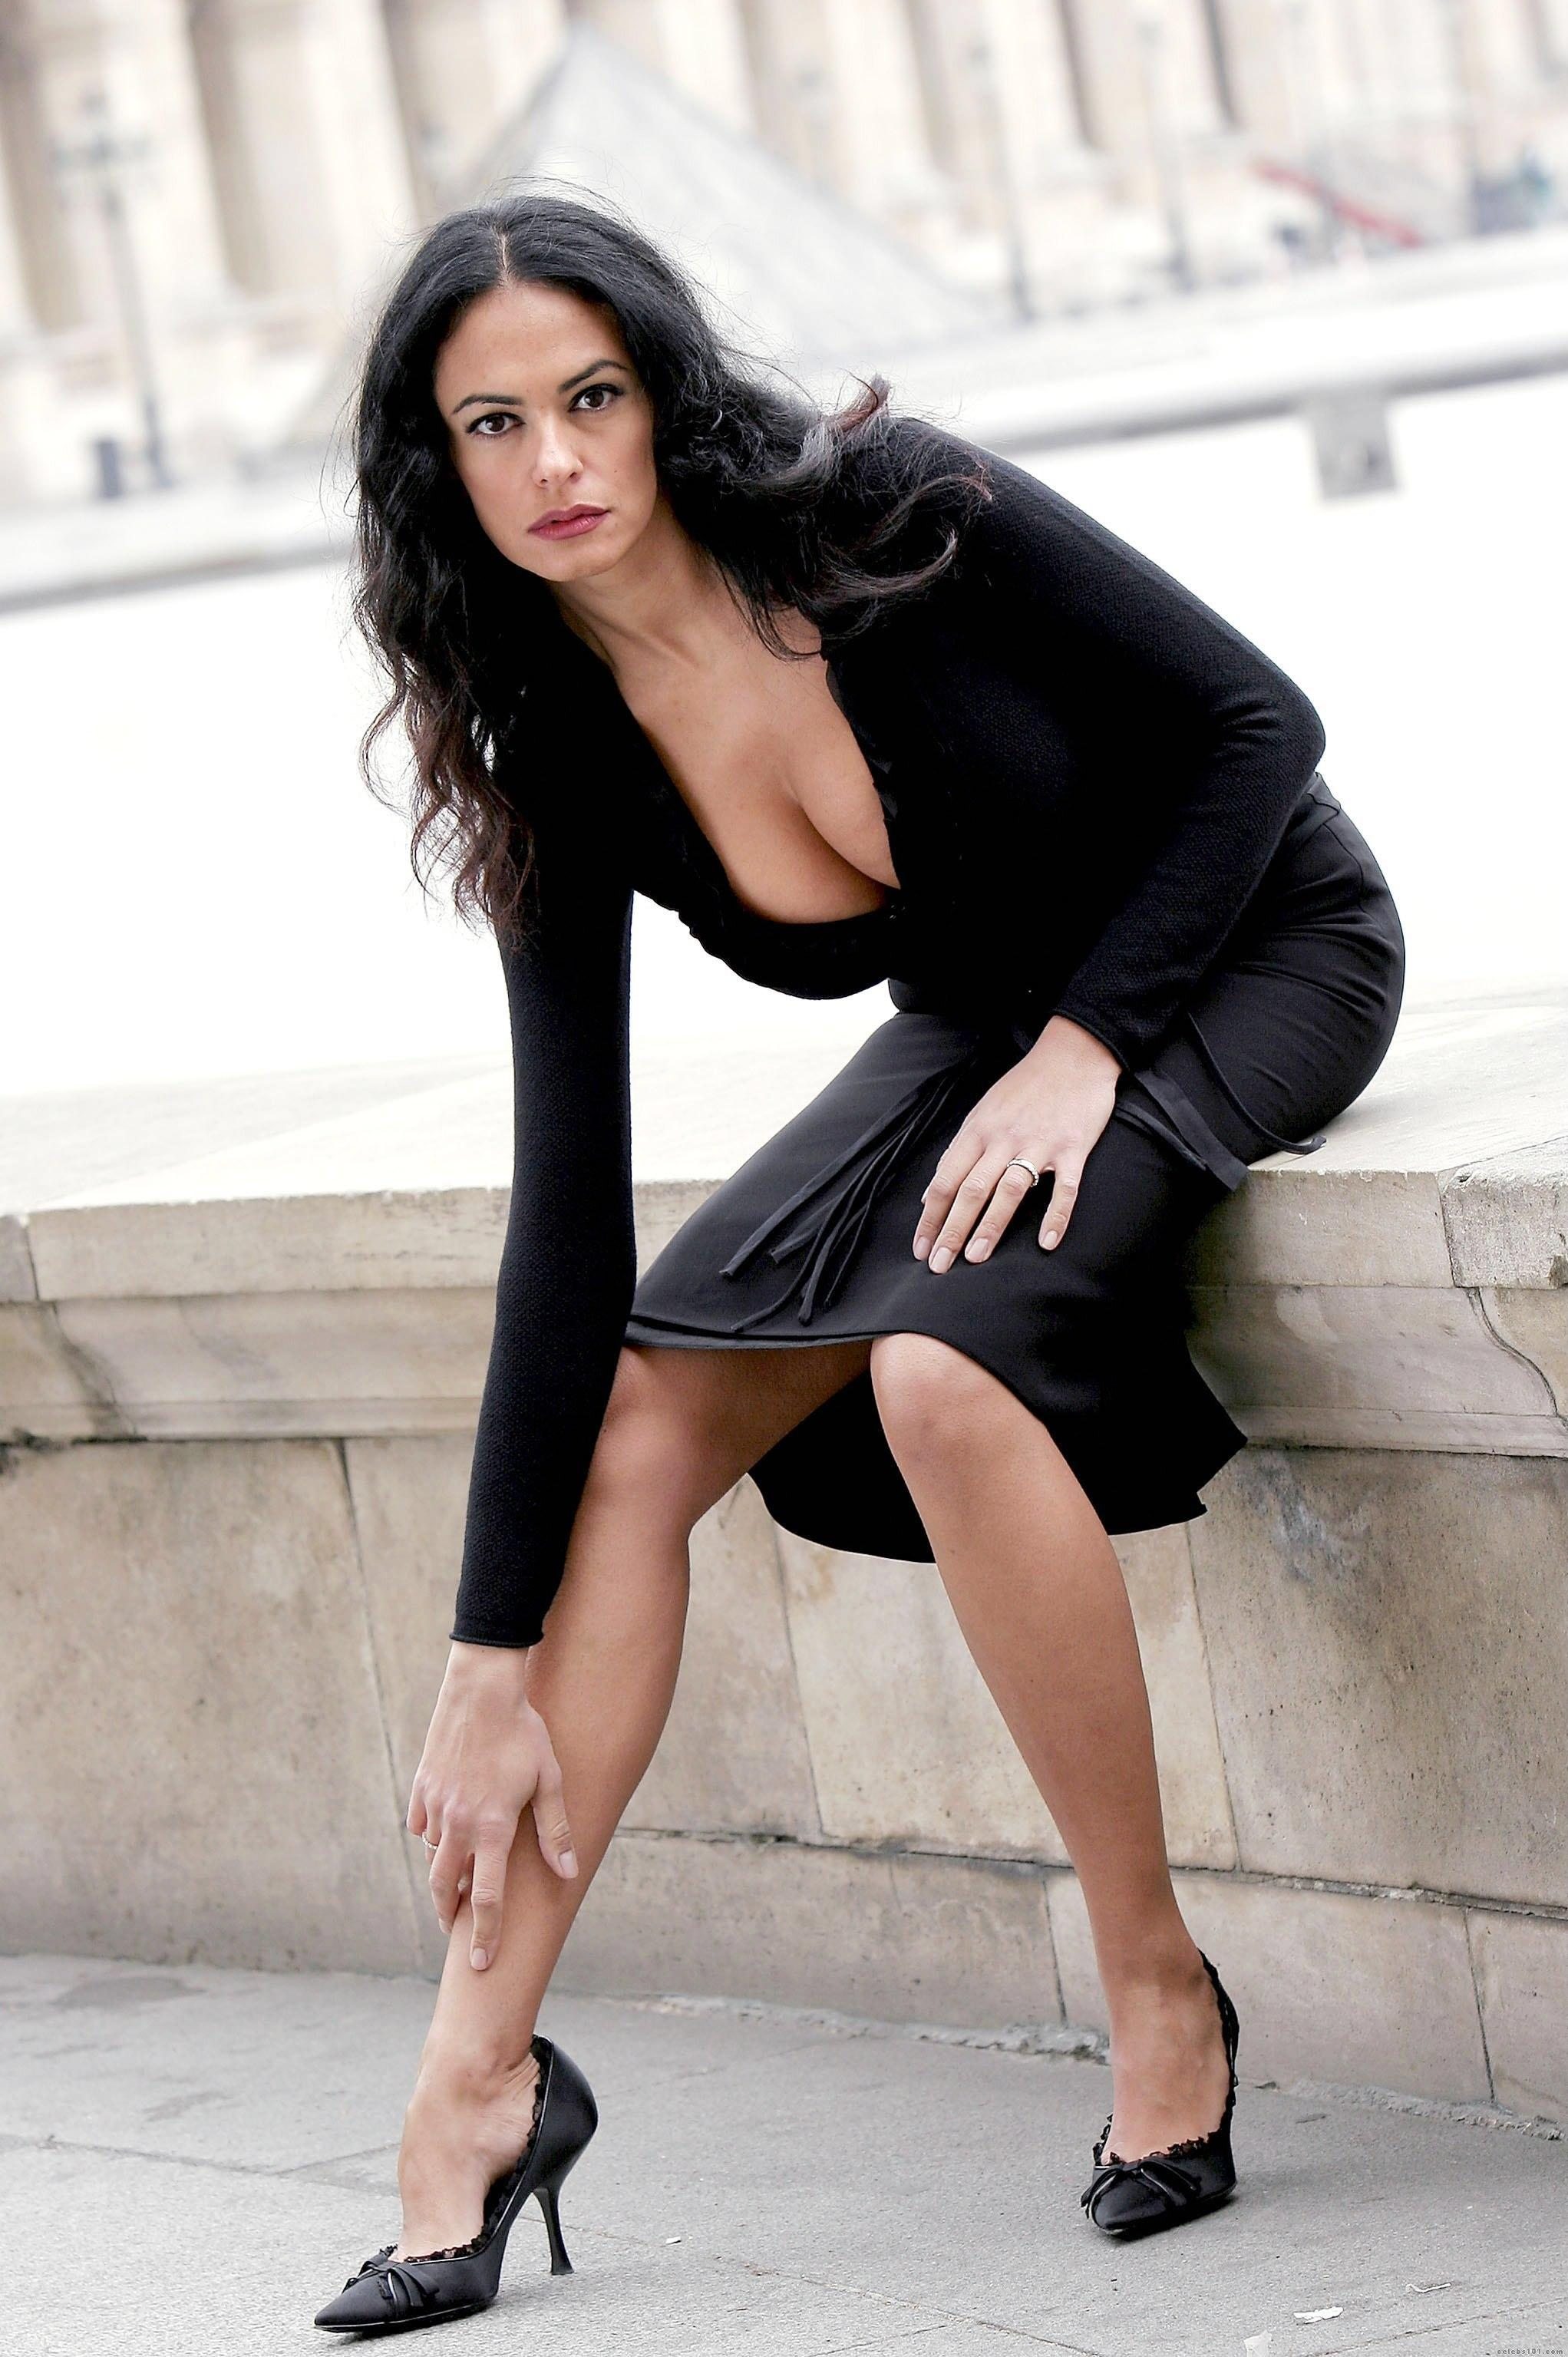 Maria Grazia Cucinotta en mini-robe très décolletée